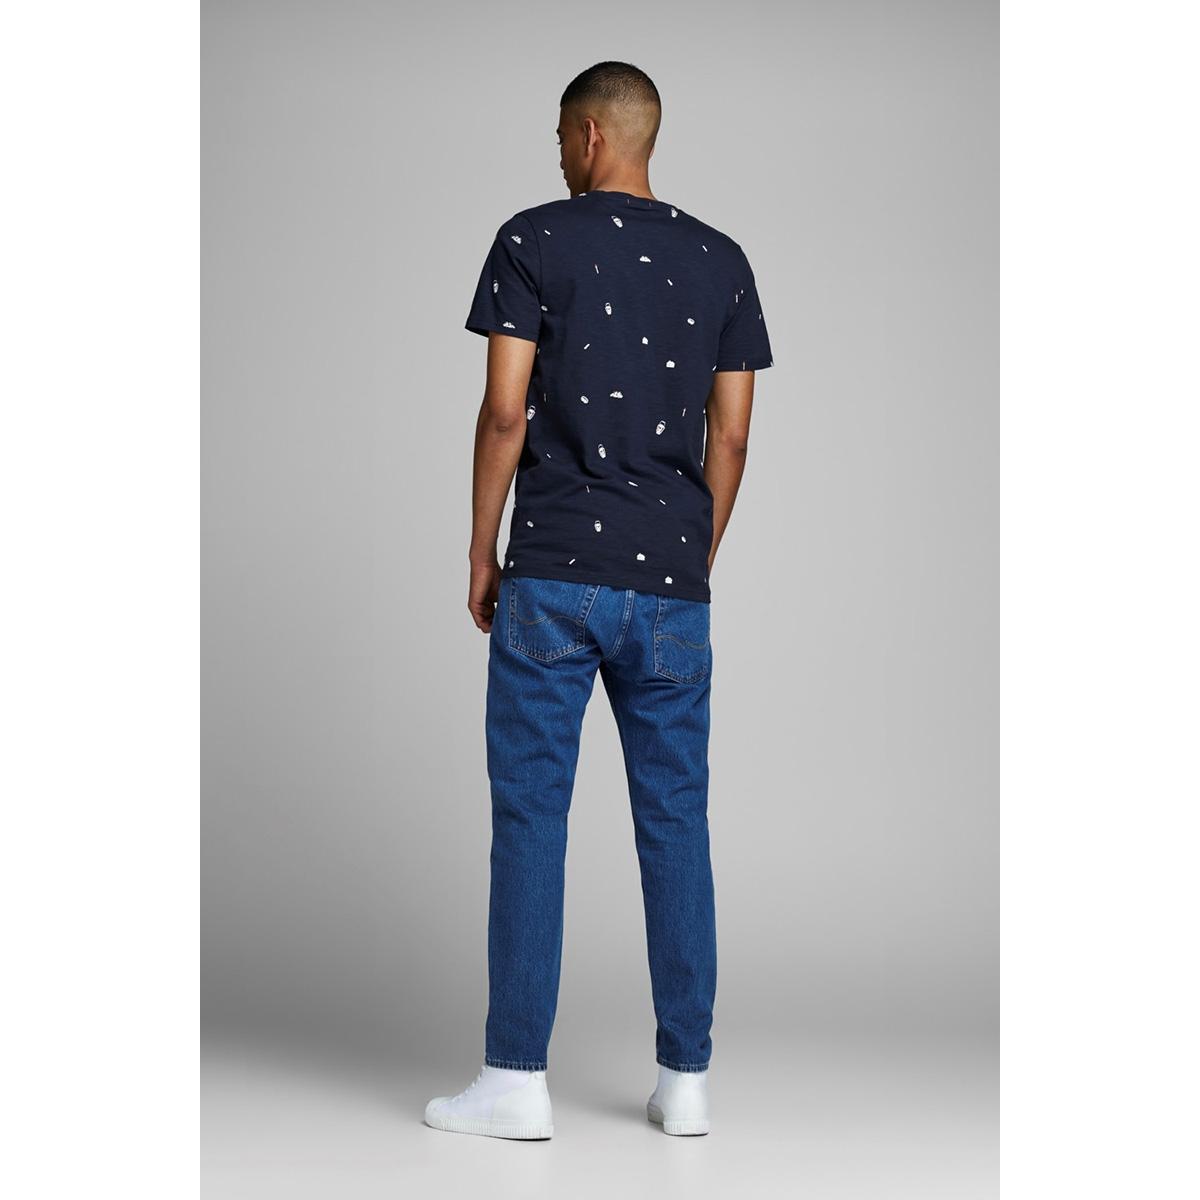 jordely tee ss crew neck 12158030 jack & jones t-shirt navy blazer/slim fit